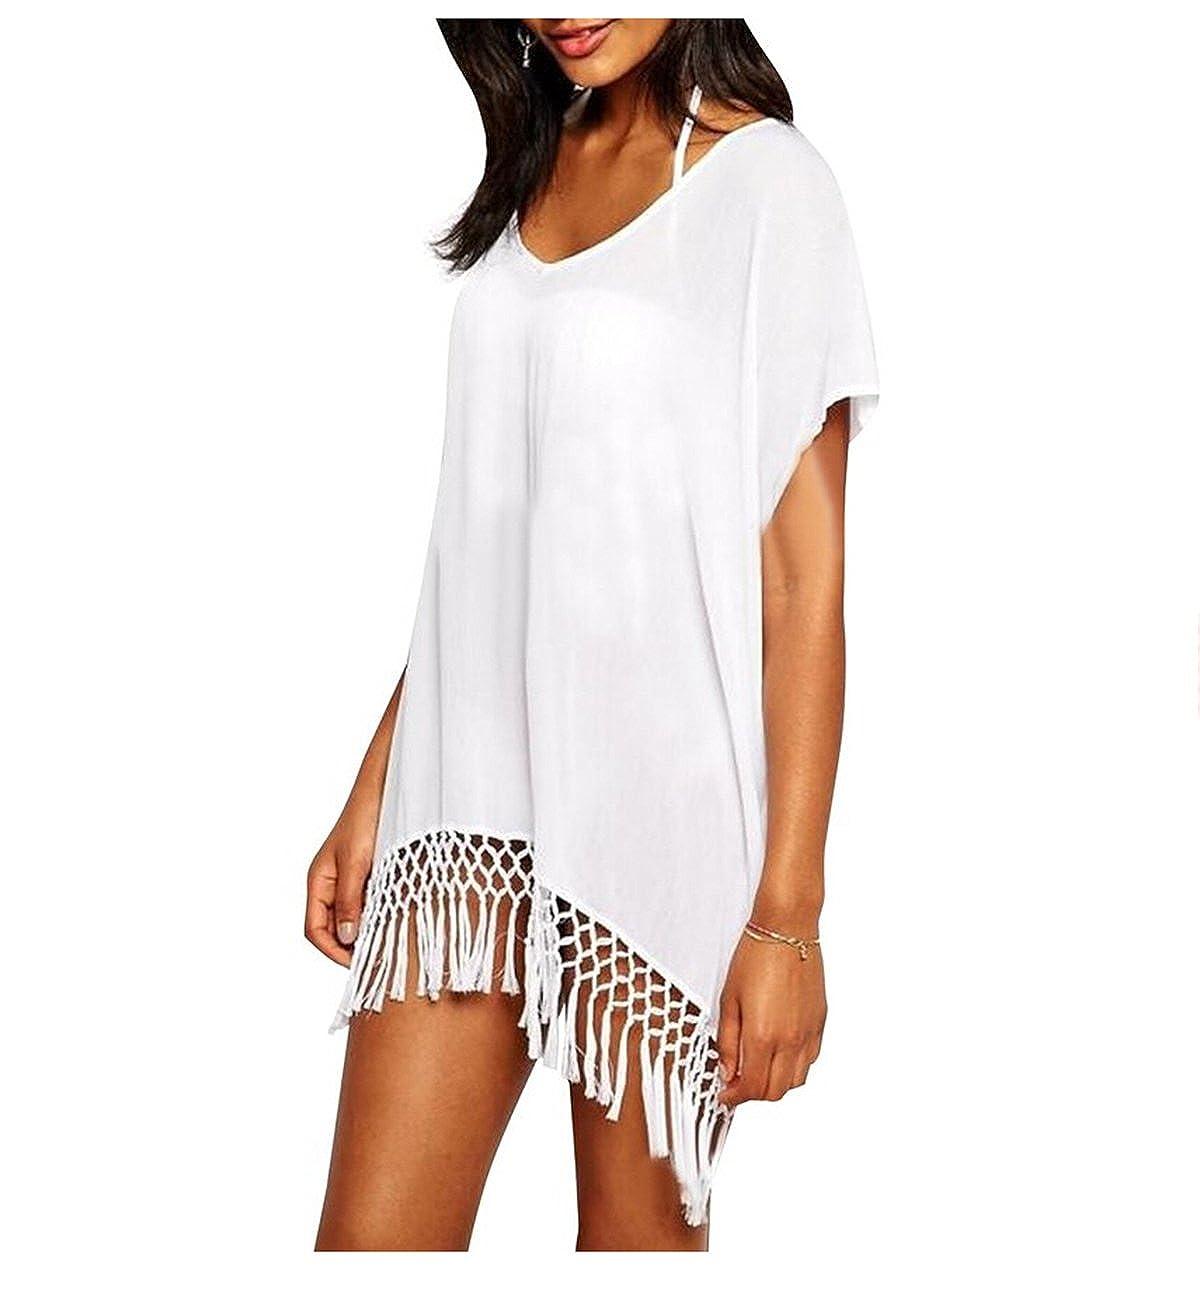 ieasysexy Women's Knitted Crochet Tunic Beach Bikini Dress V-neck Cover-ups